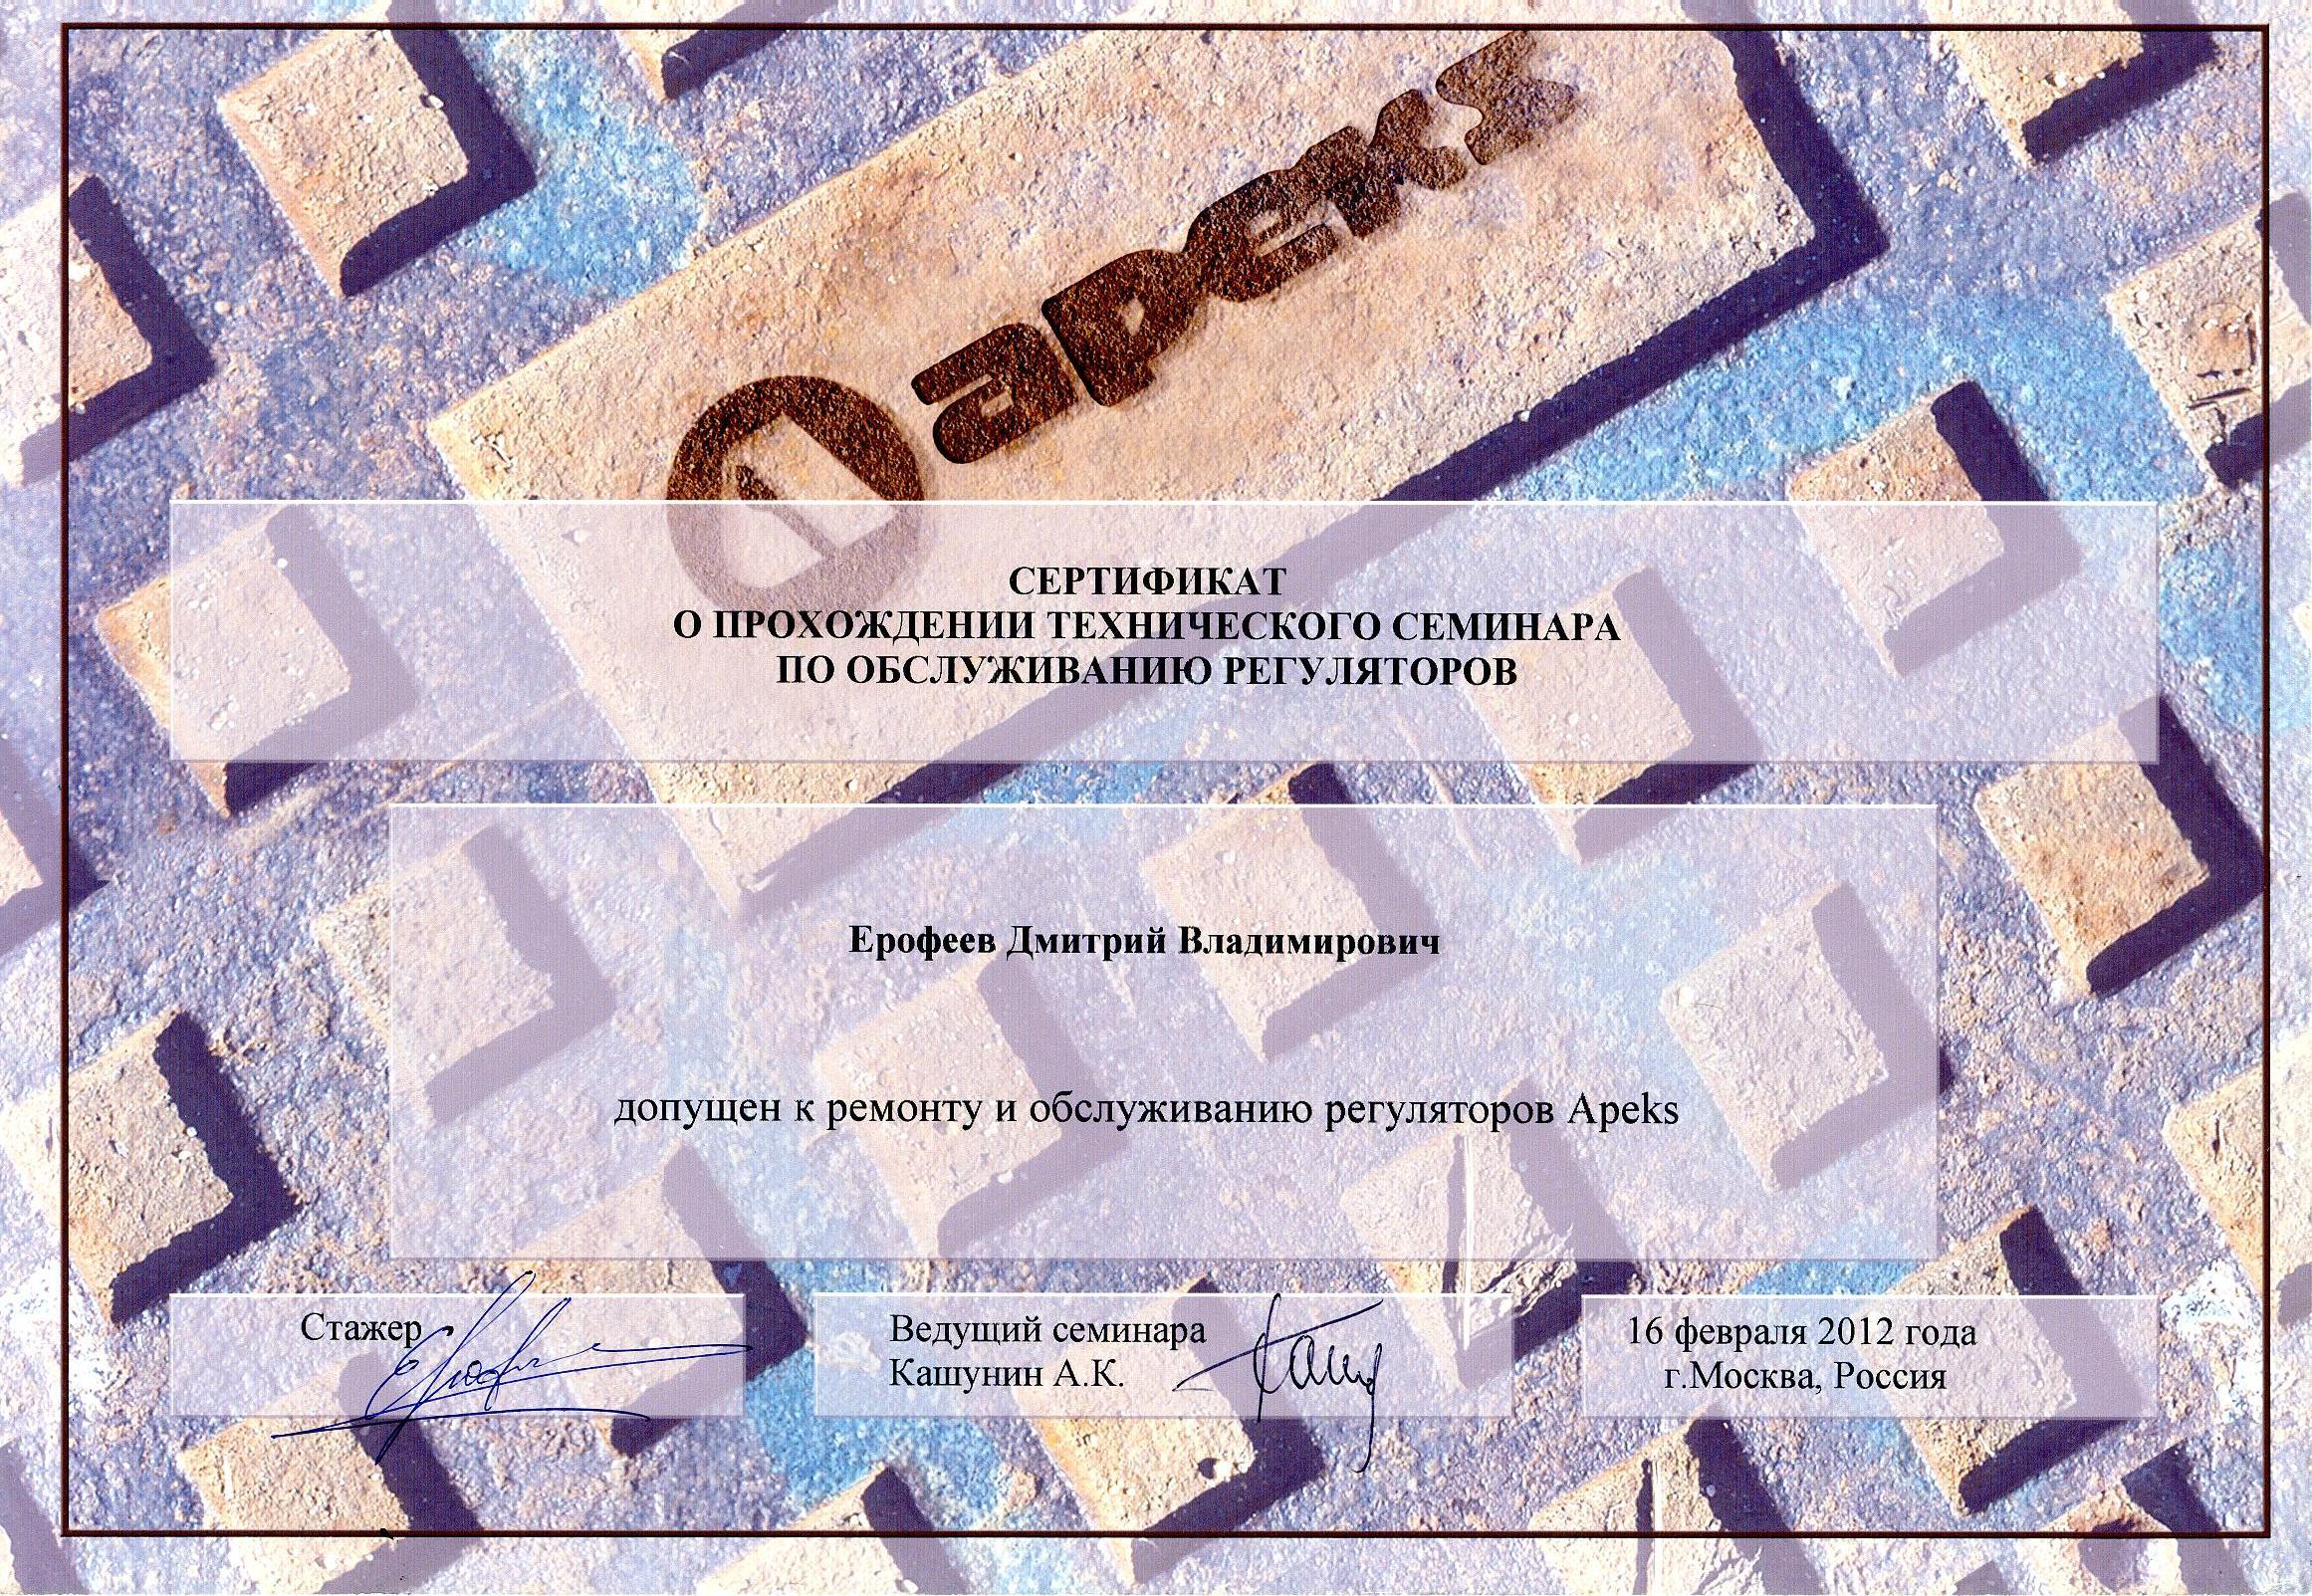 Сертификат Apeks